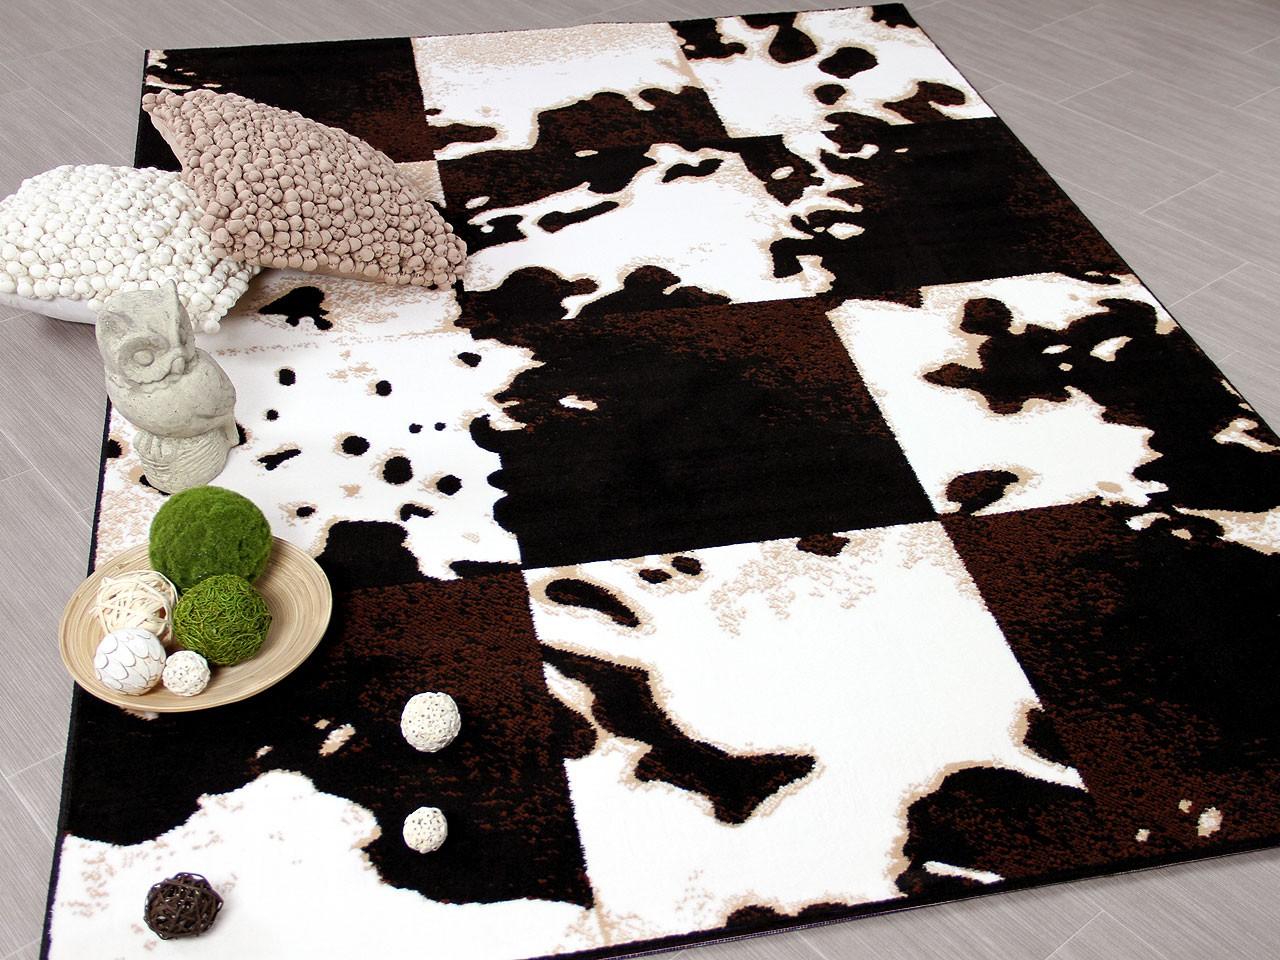 designer teppich safari kuh patchwork teppiche designerteppiche safari teppiche. Black Bedroom Furniture Sets. Home Design Ideas